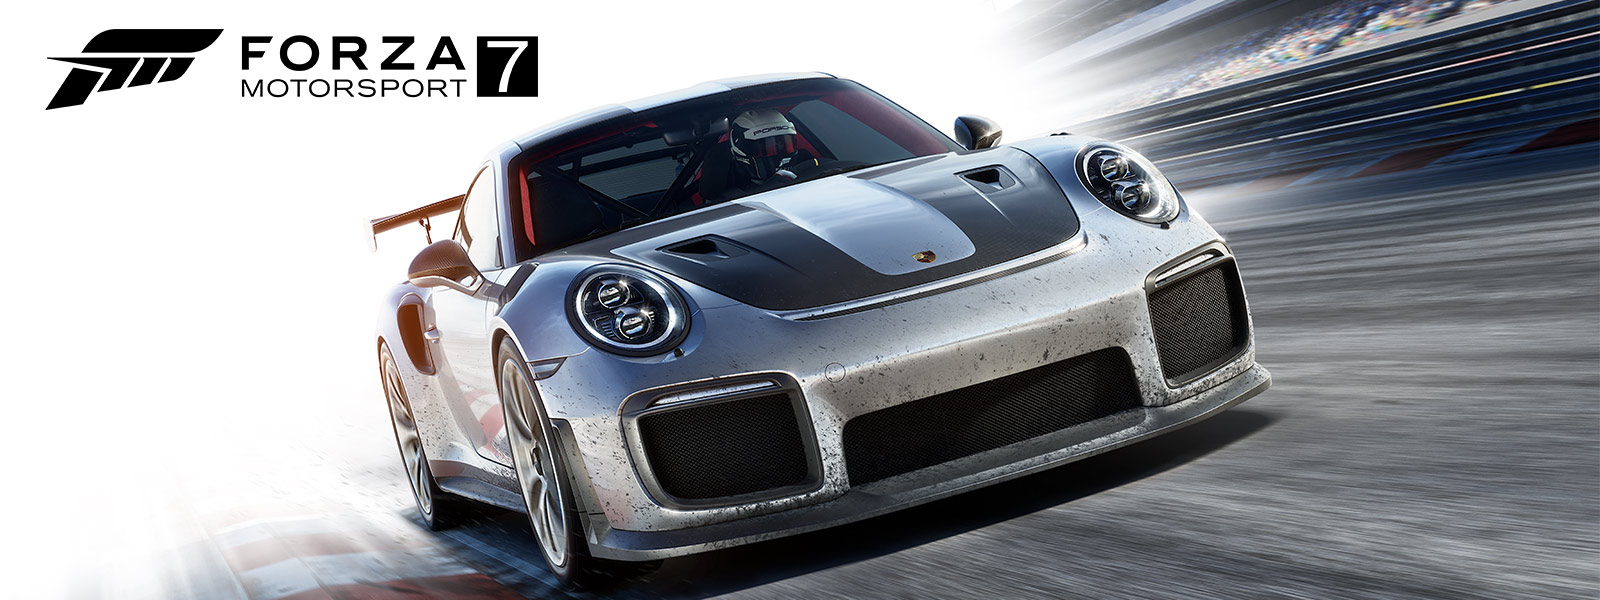 Écran du jeu ForzaMotorsport7